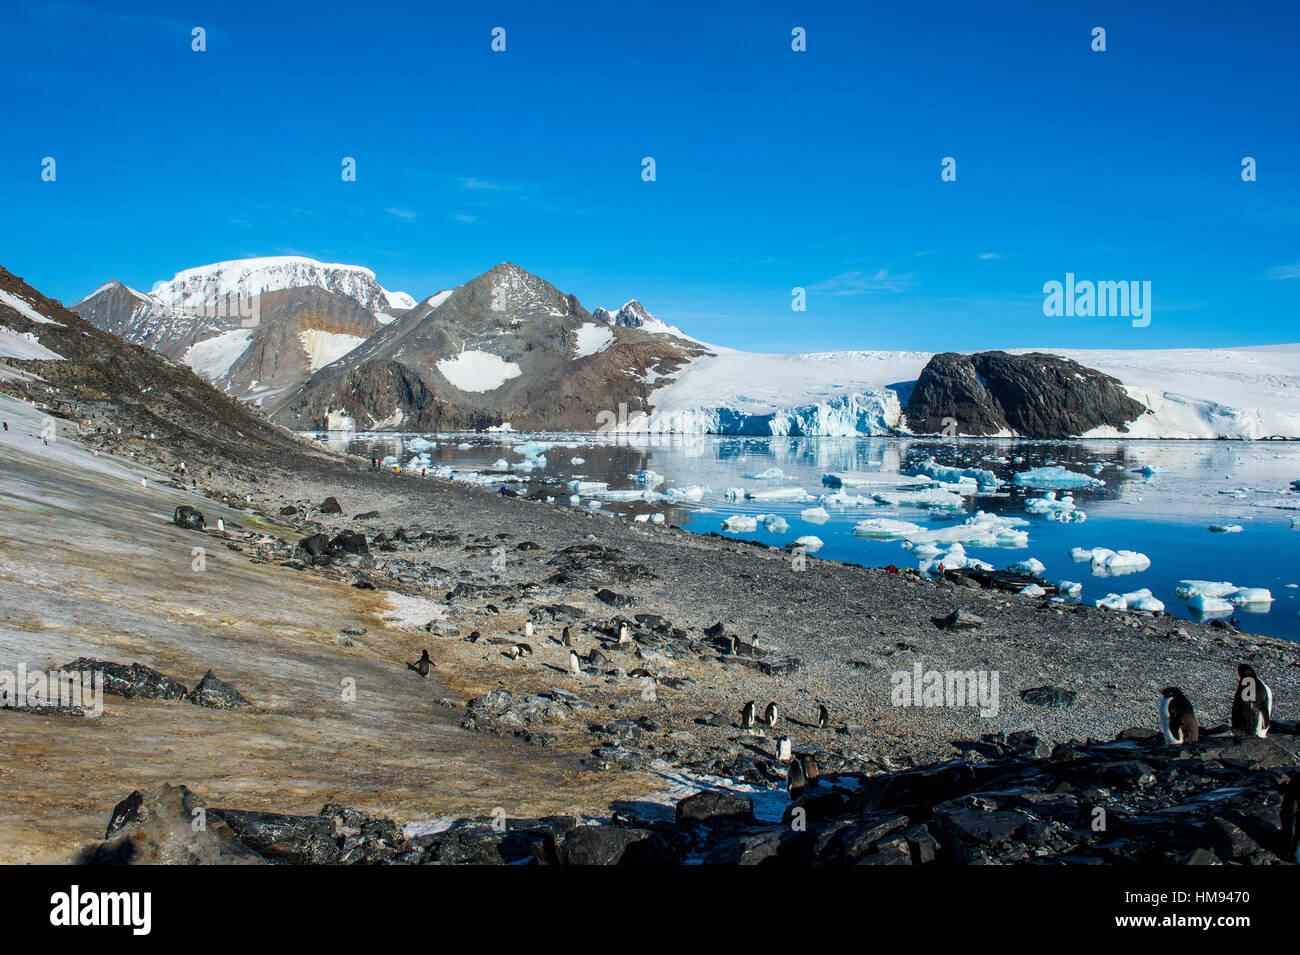 Adelie penguin (Pygoscelis adeliae) colony in Hope Bay, Antarctica, Polar Regions - Stock Image